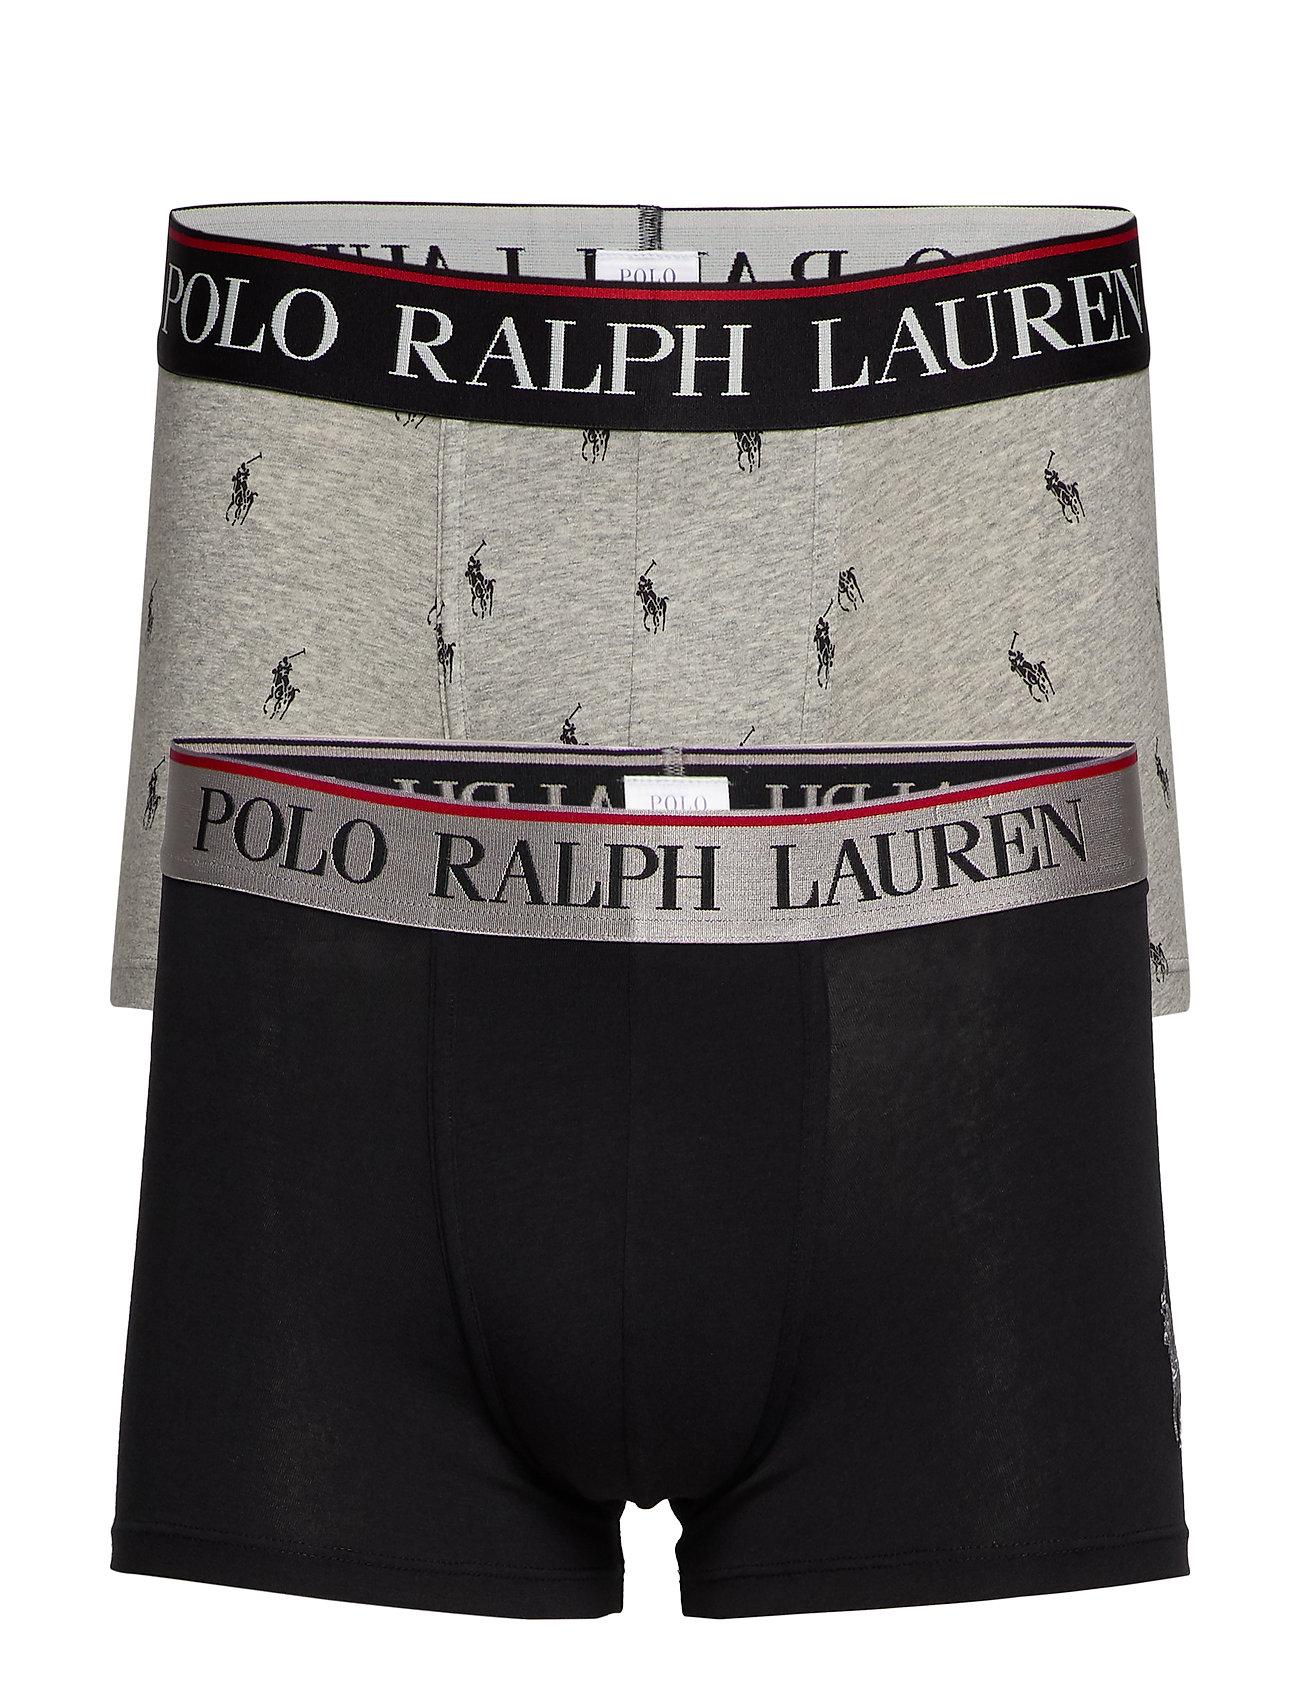 Polo Ralph Lauren Underwear COTTON/ELASTANE-2PK-TRN - 2PK POLO BLK/ AND